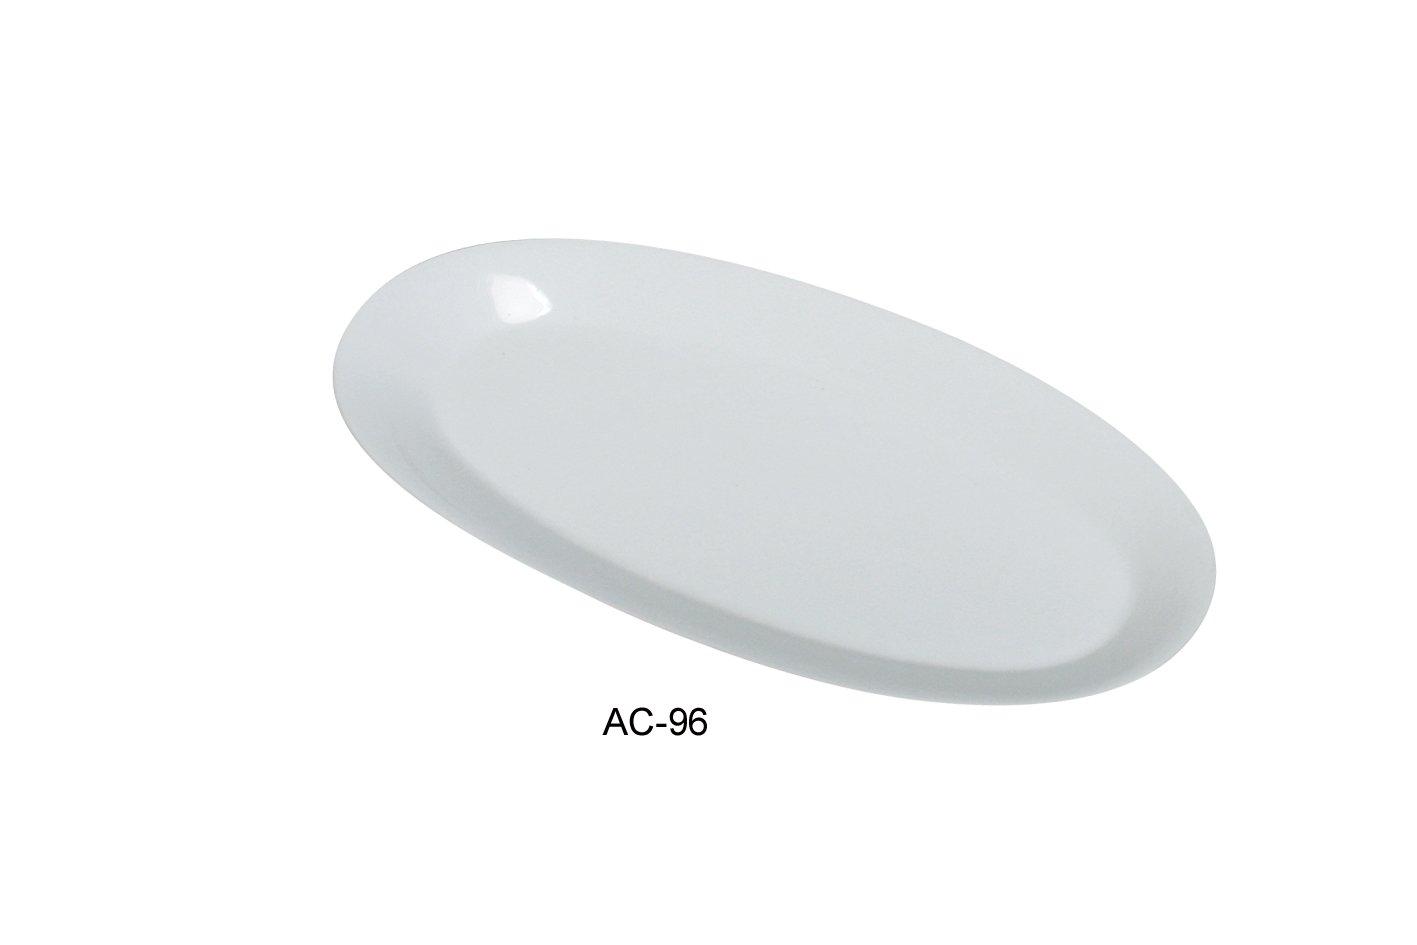 Yanco Abco Collection Elegant Porcelain Platter in Super White 16'' * 7 3/4'' * 1 1/4'' Box of 12